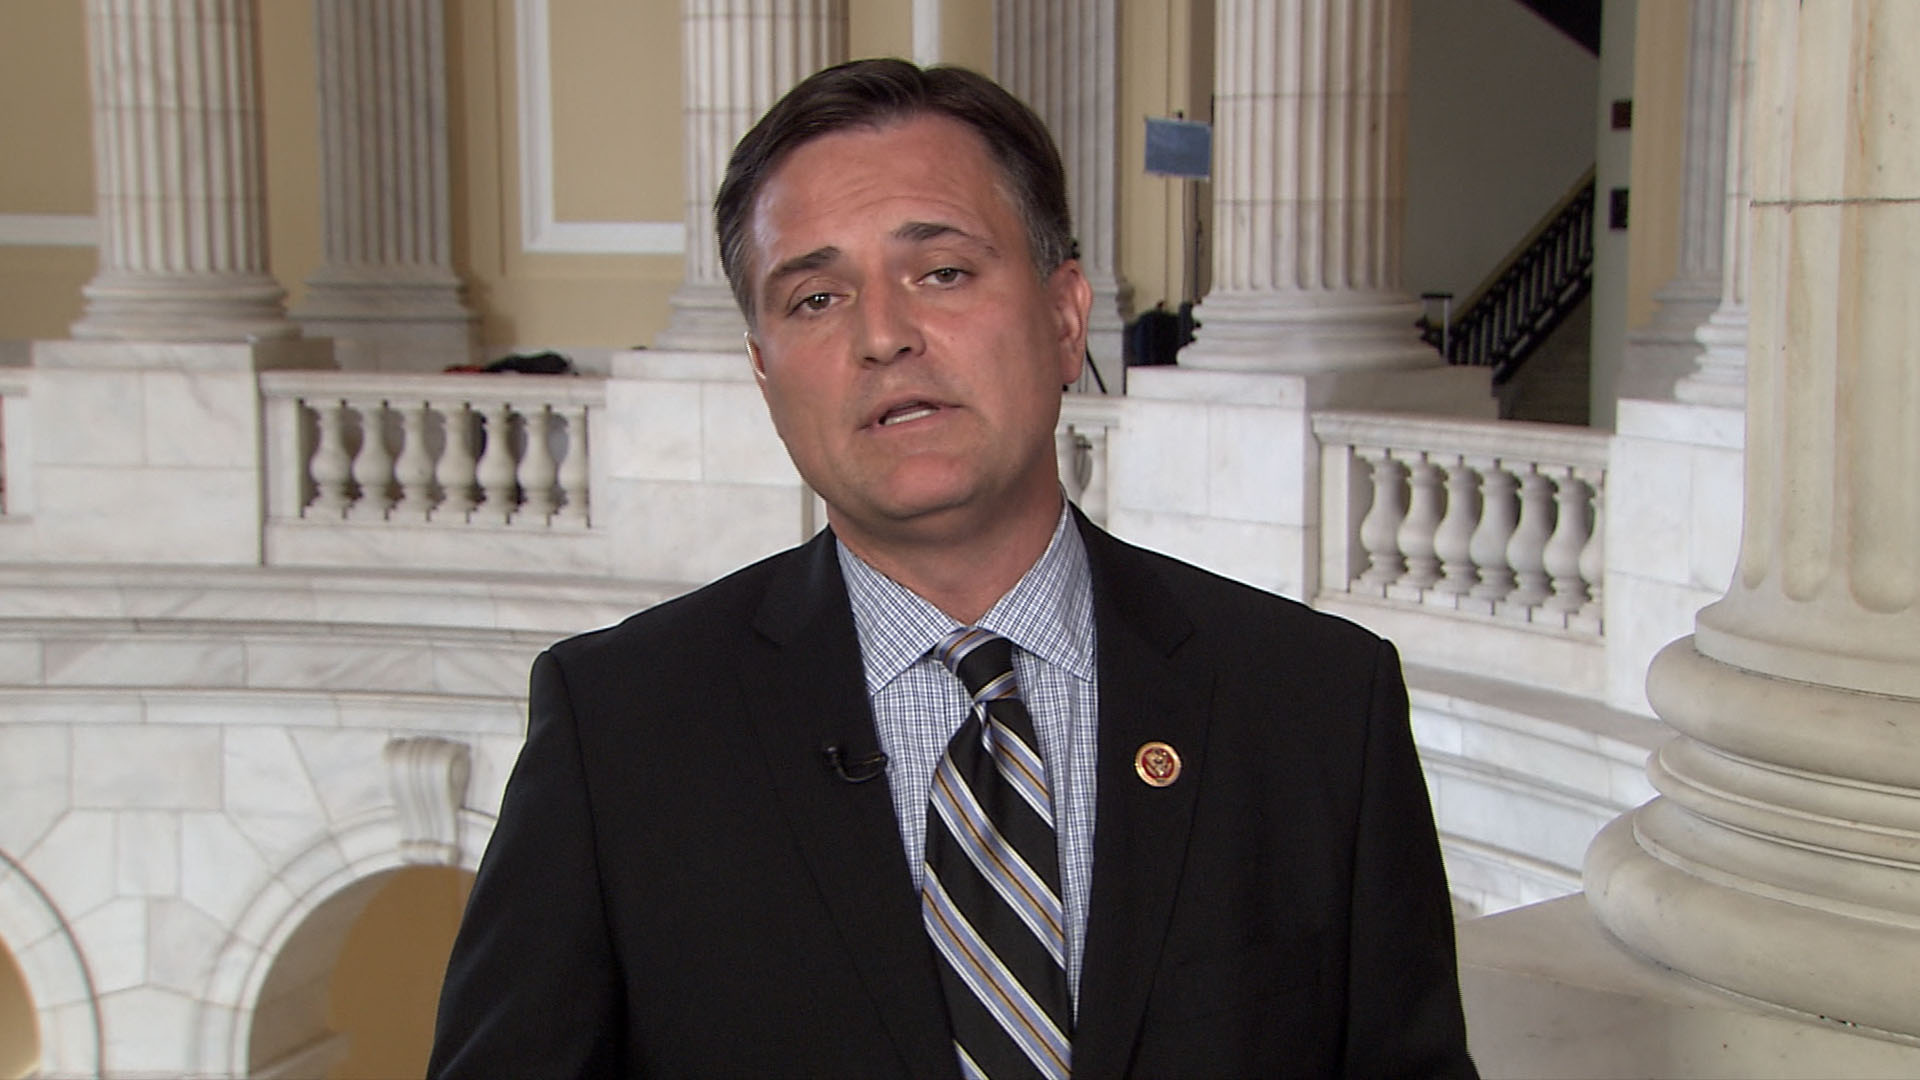 GOP Rep: 'President refuses to talk'